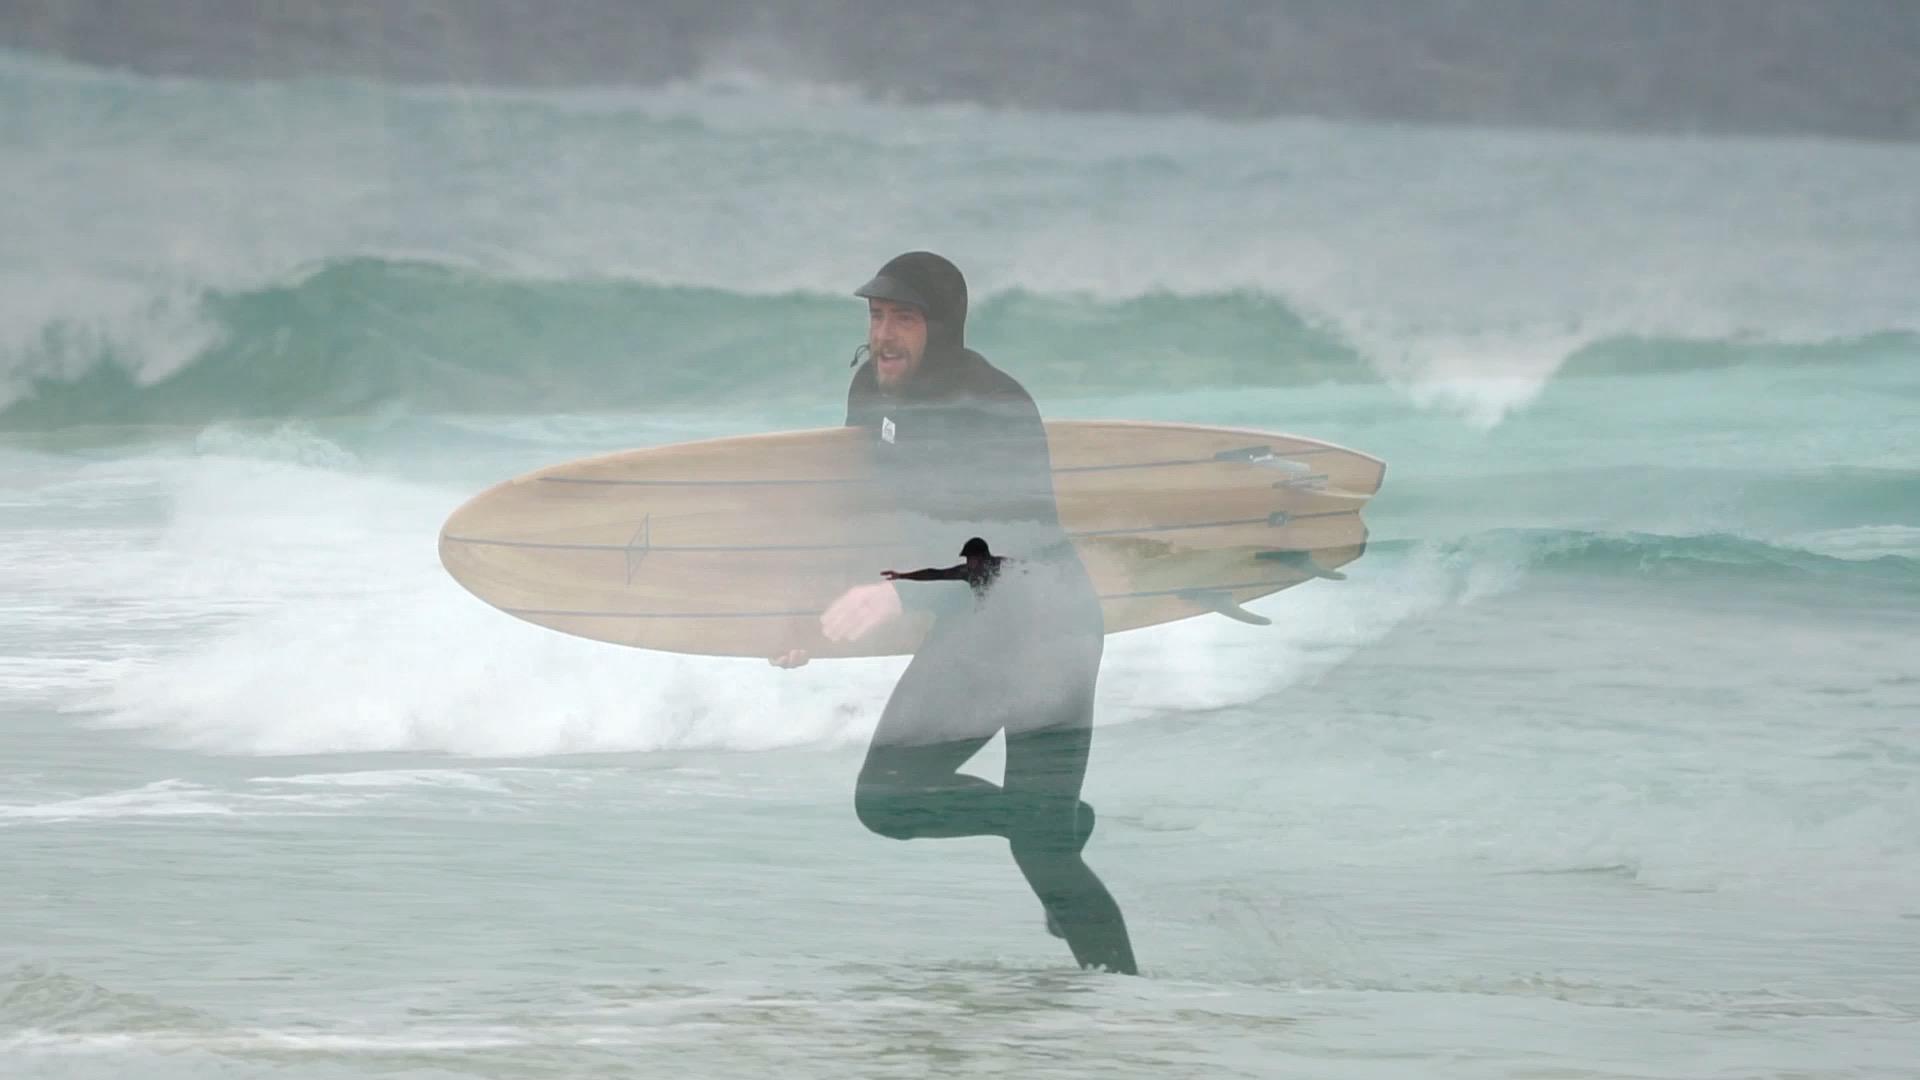 Lignum Surfboards in situ